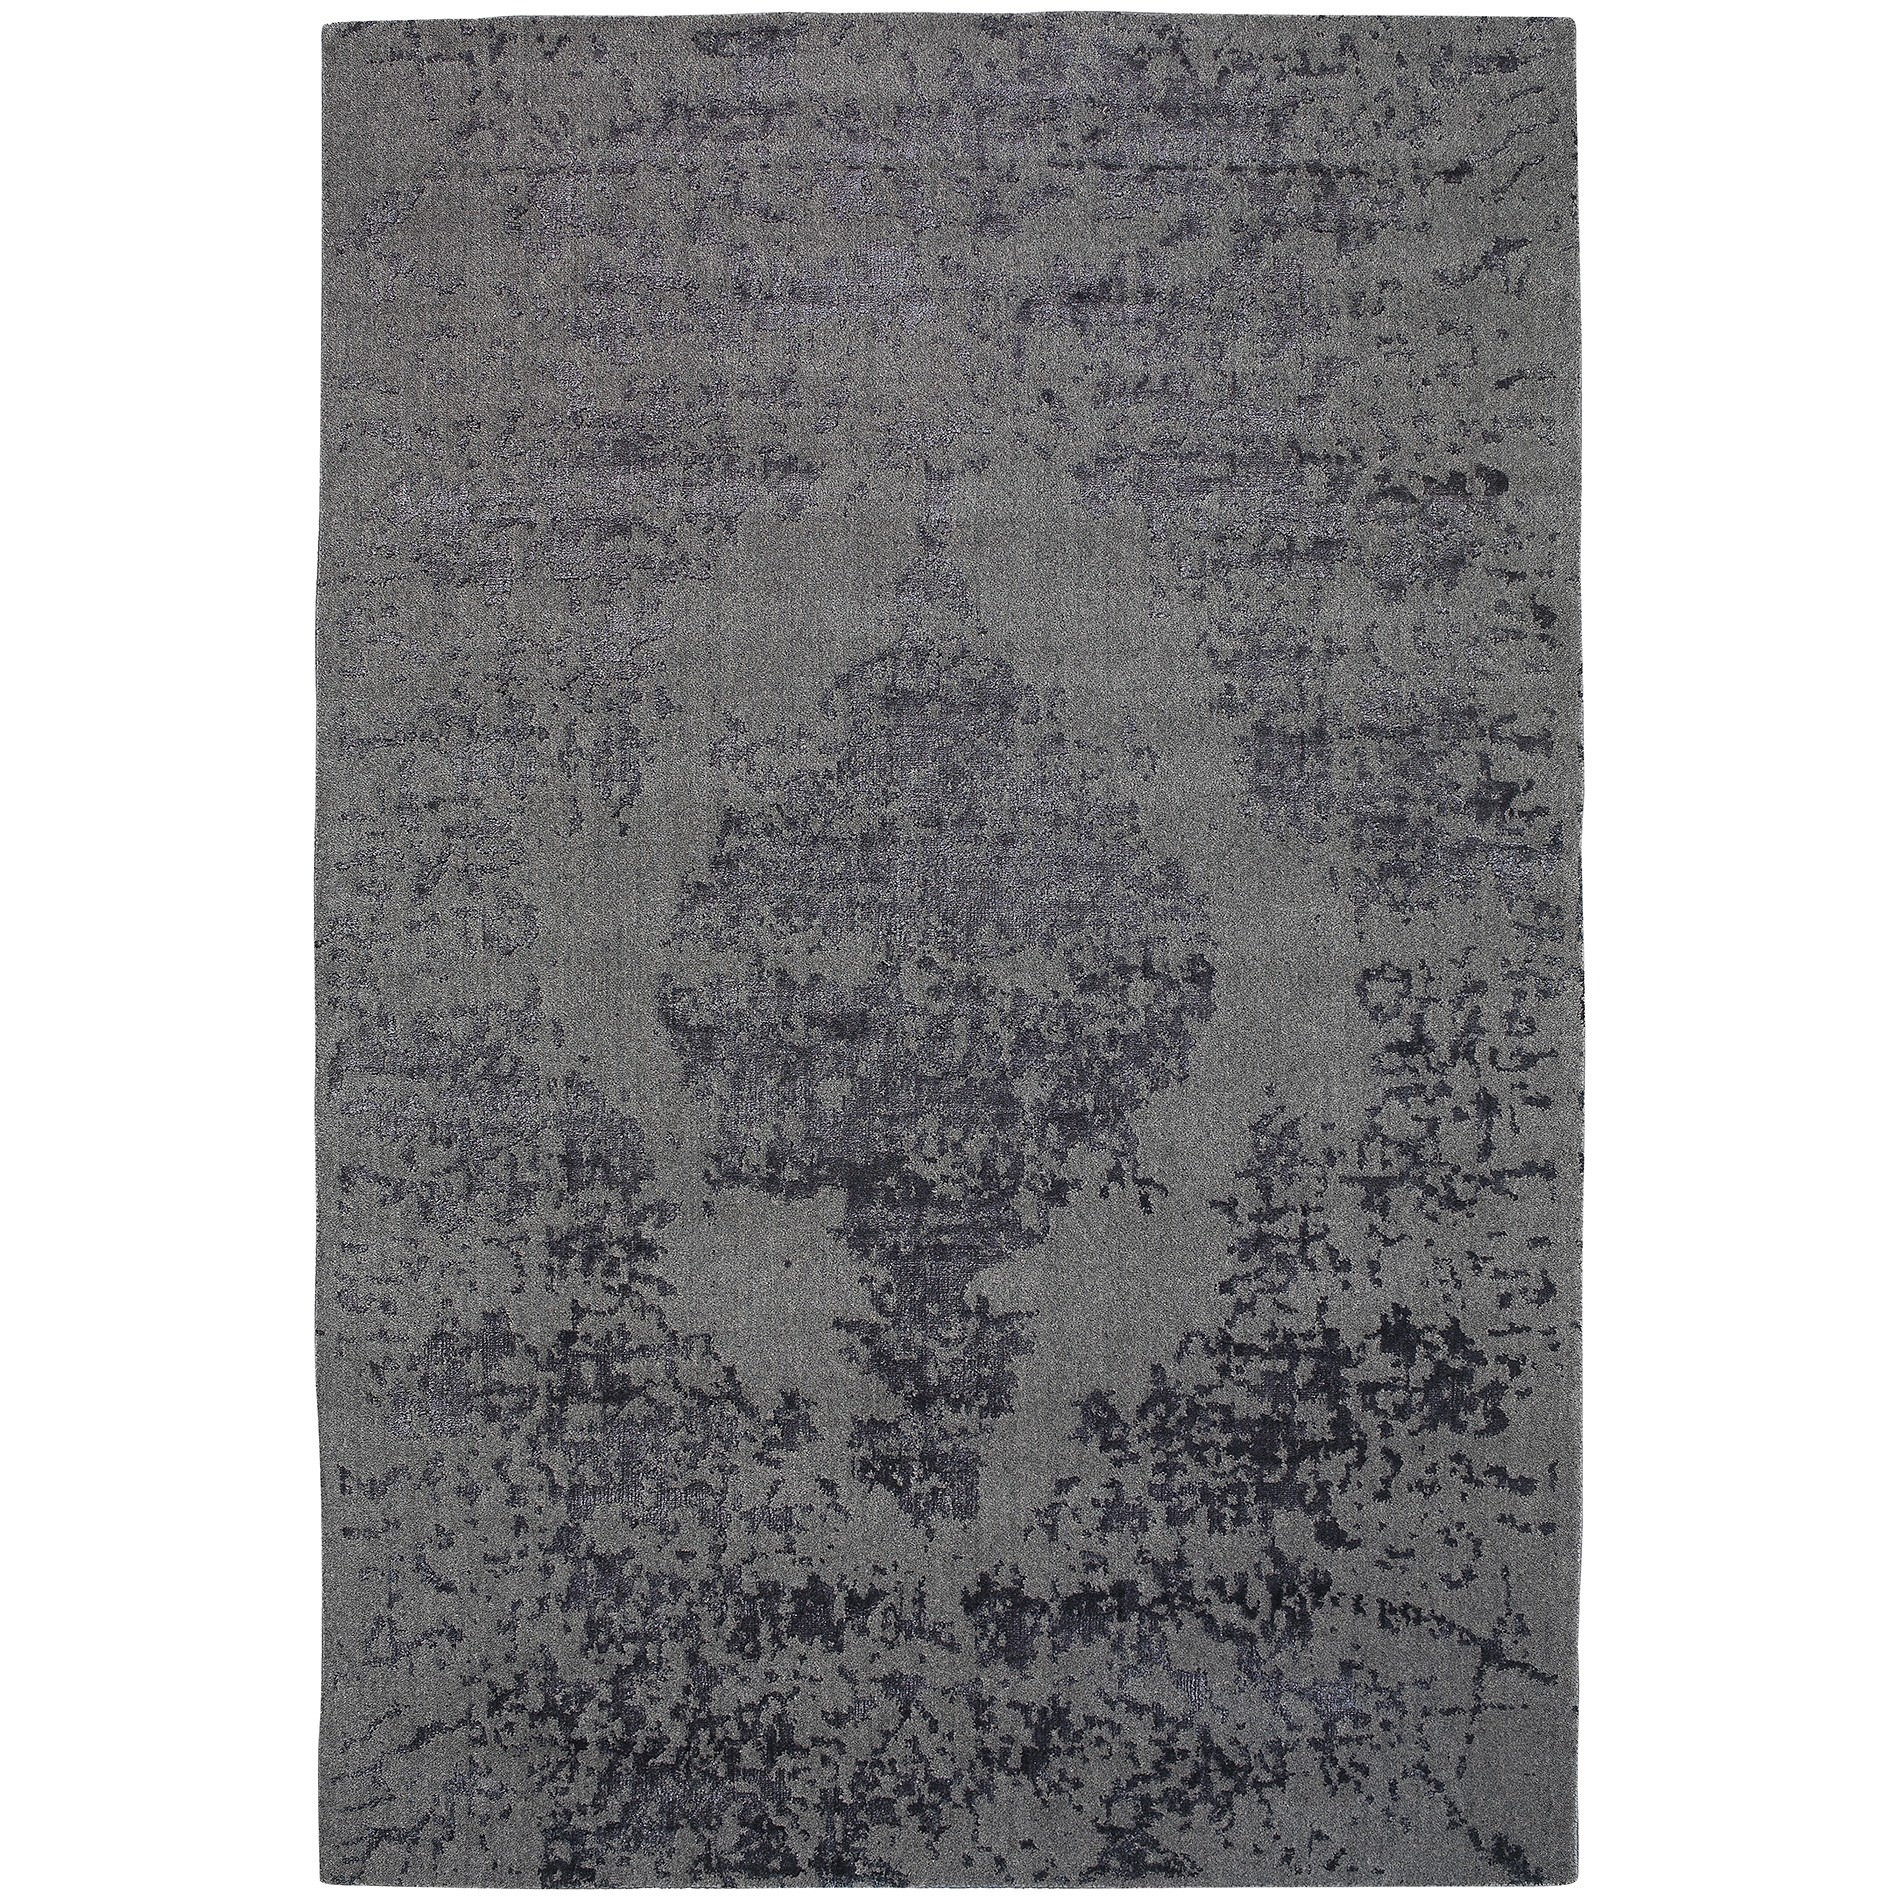 Vienna No.049 Handmade Wool Transitional Rug, 330x240cm, Smoke